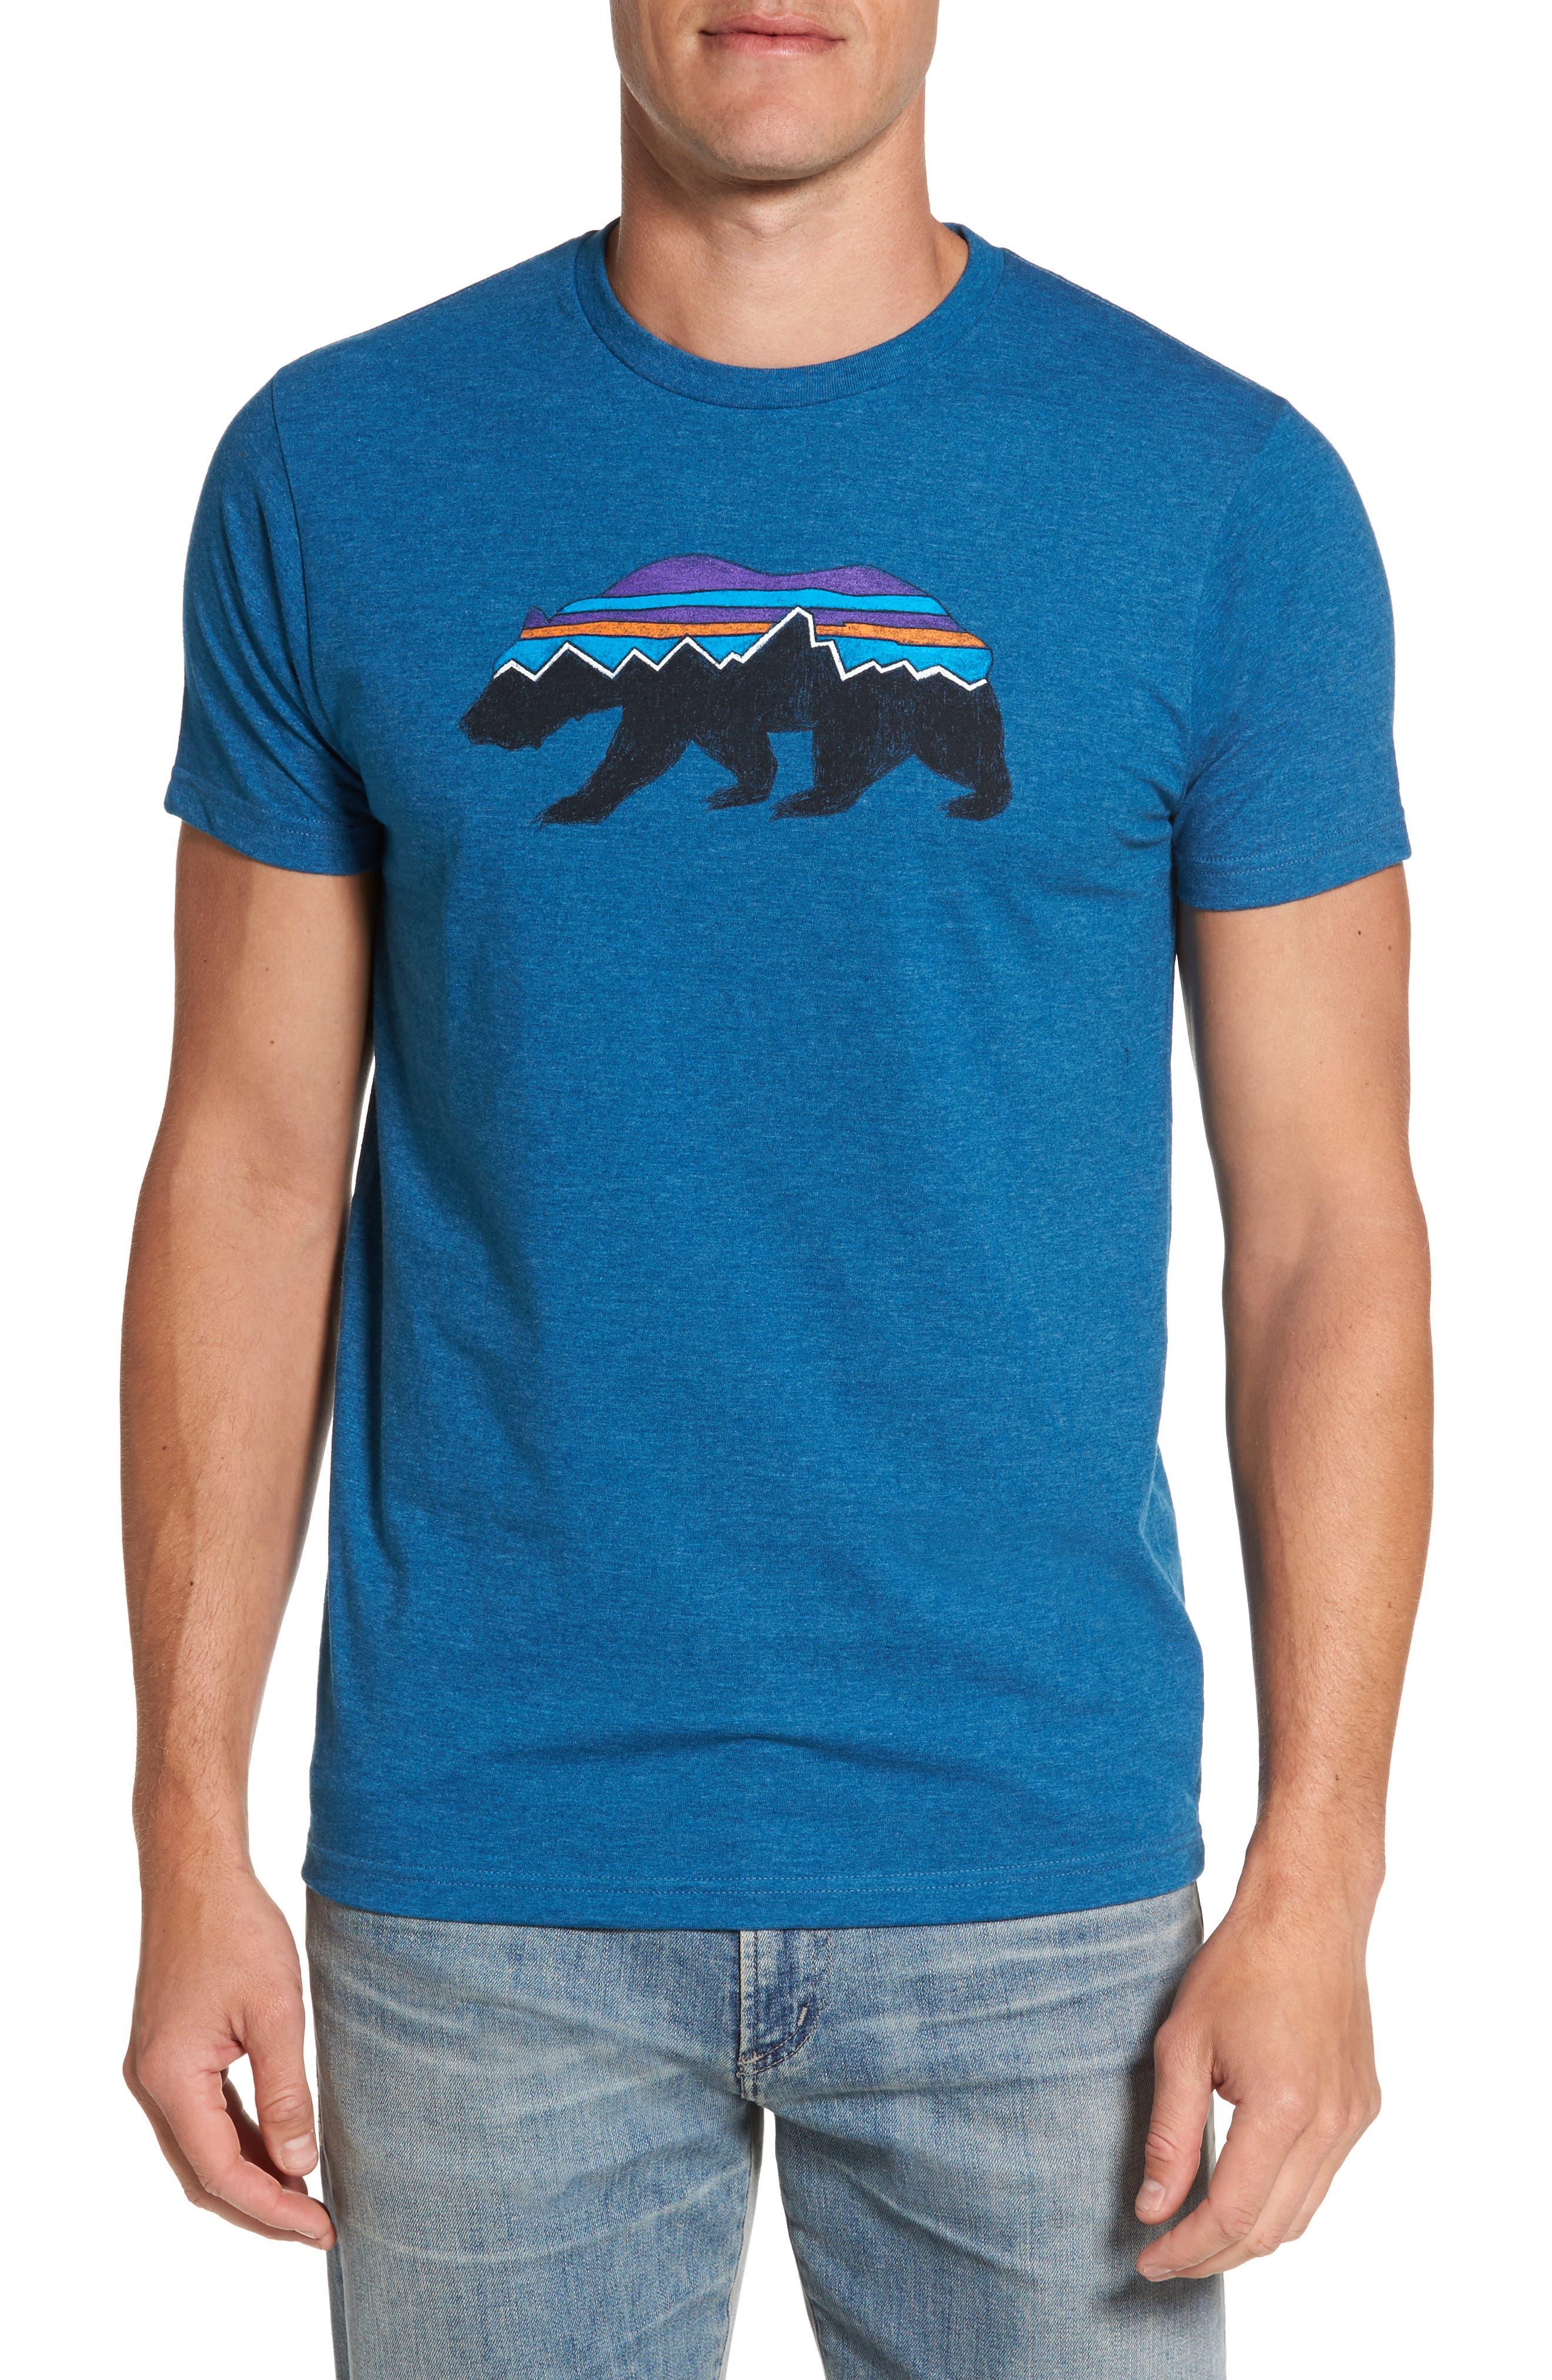 Patagonia Fitzroy Bear Graphic T-Shirt